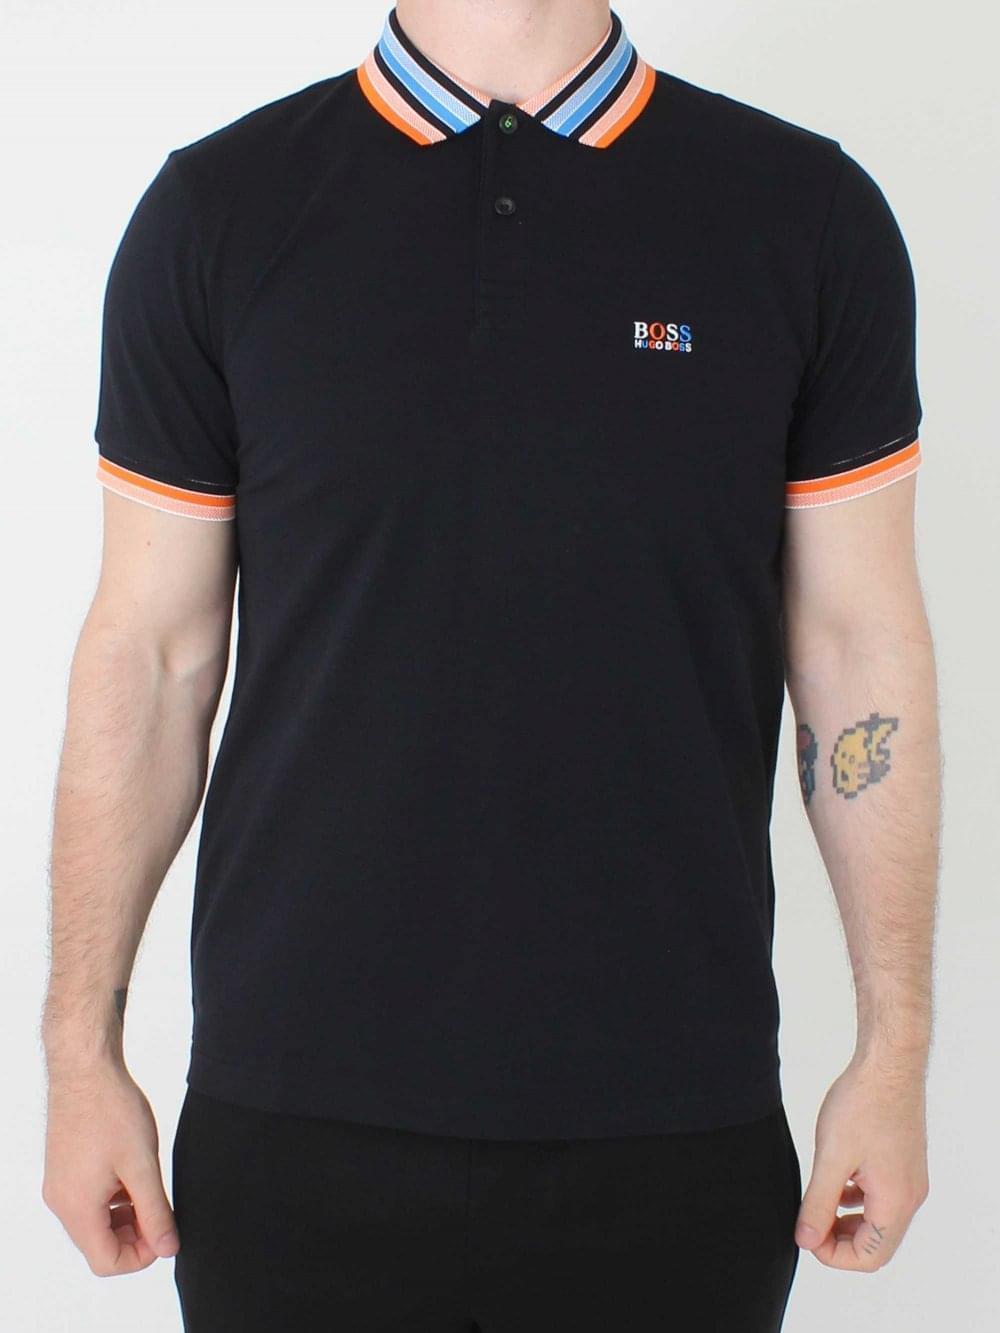 7ec7dde0b Hugo Boss Paddy 1 Polo in Black | Northern Threads